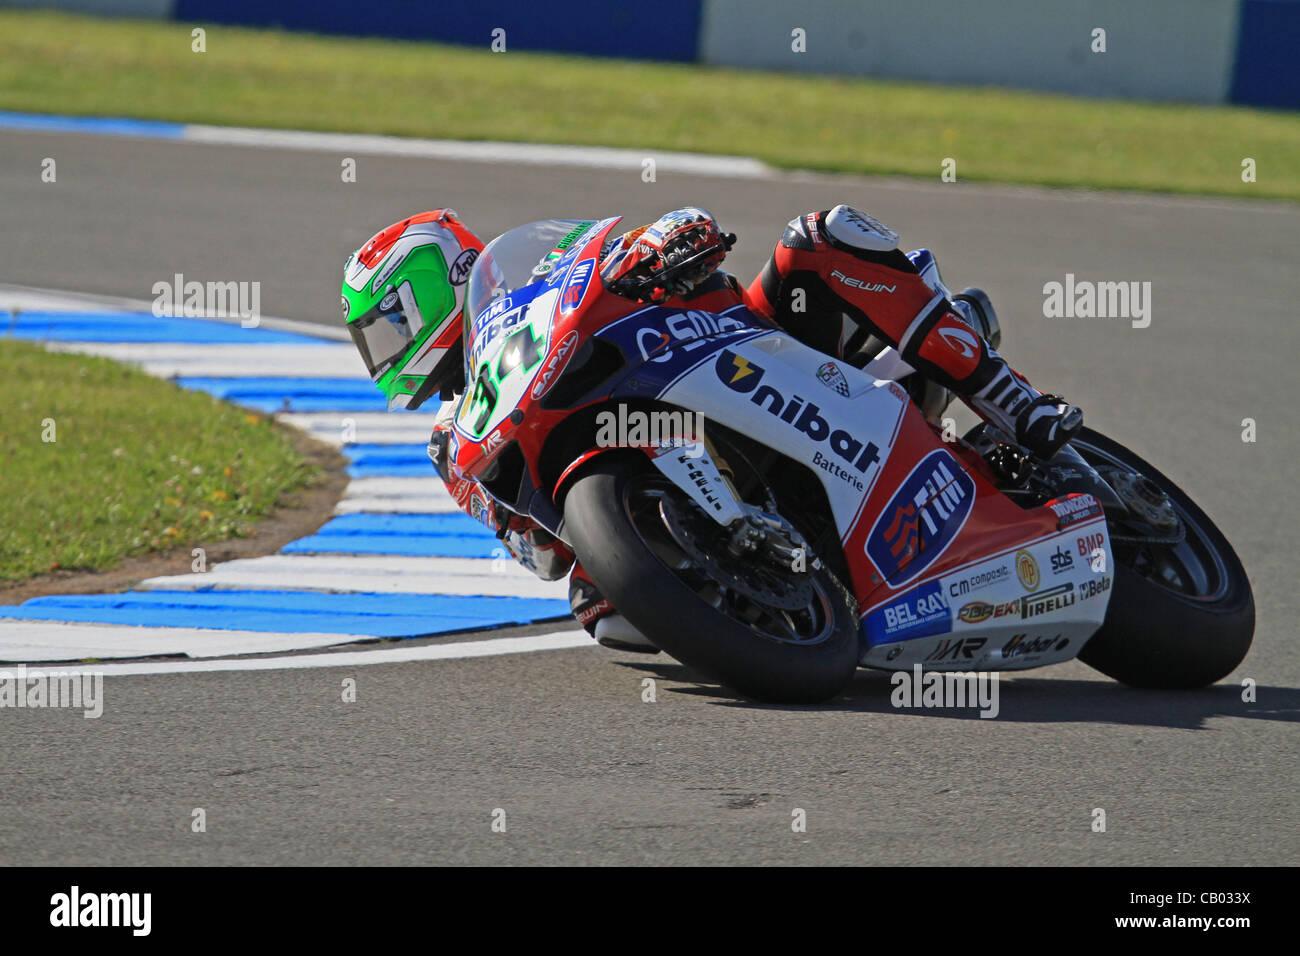 UK. 12.05.2012. Donington Park, England.  Davide Giugliano rides a Ducati 1098R for Althea Racing in the  World Stock Photo